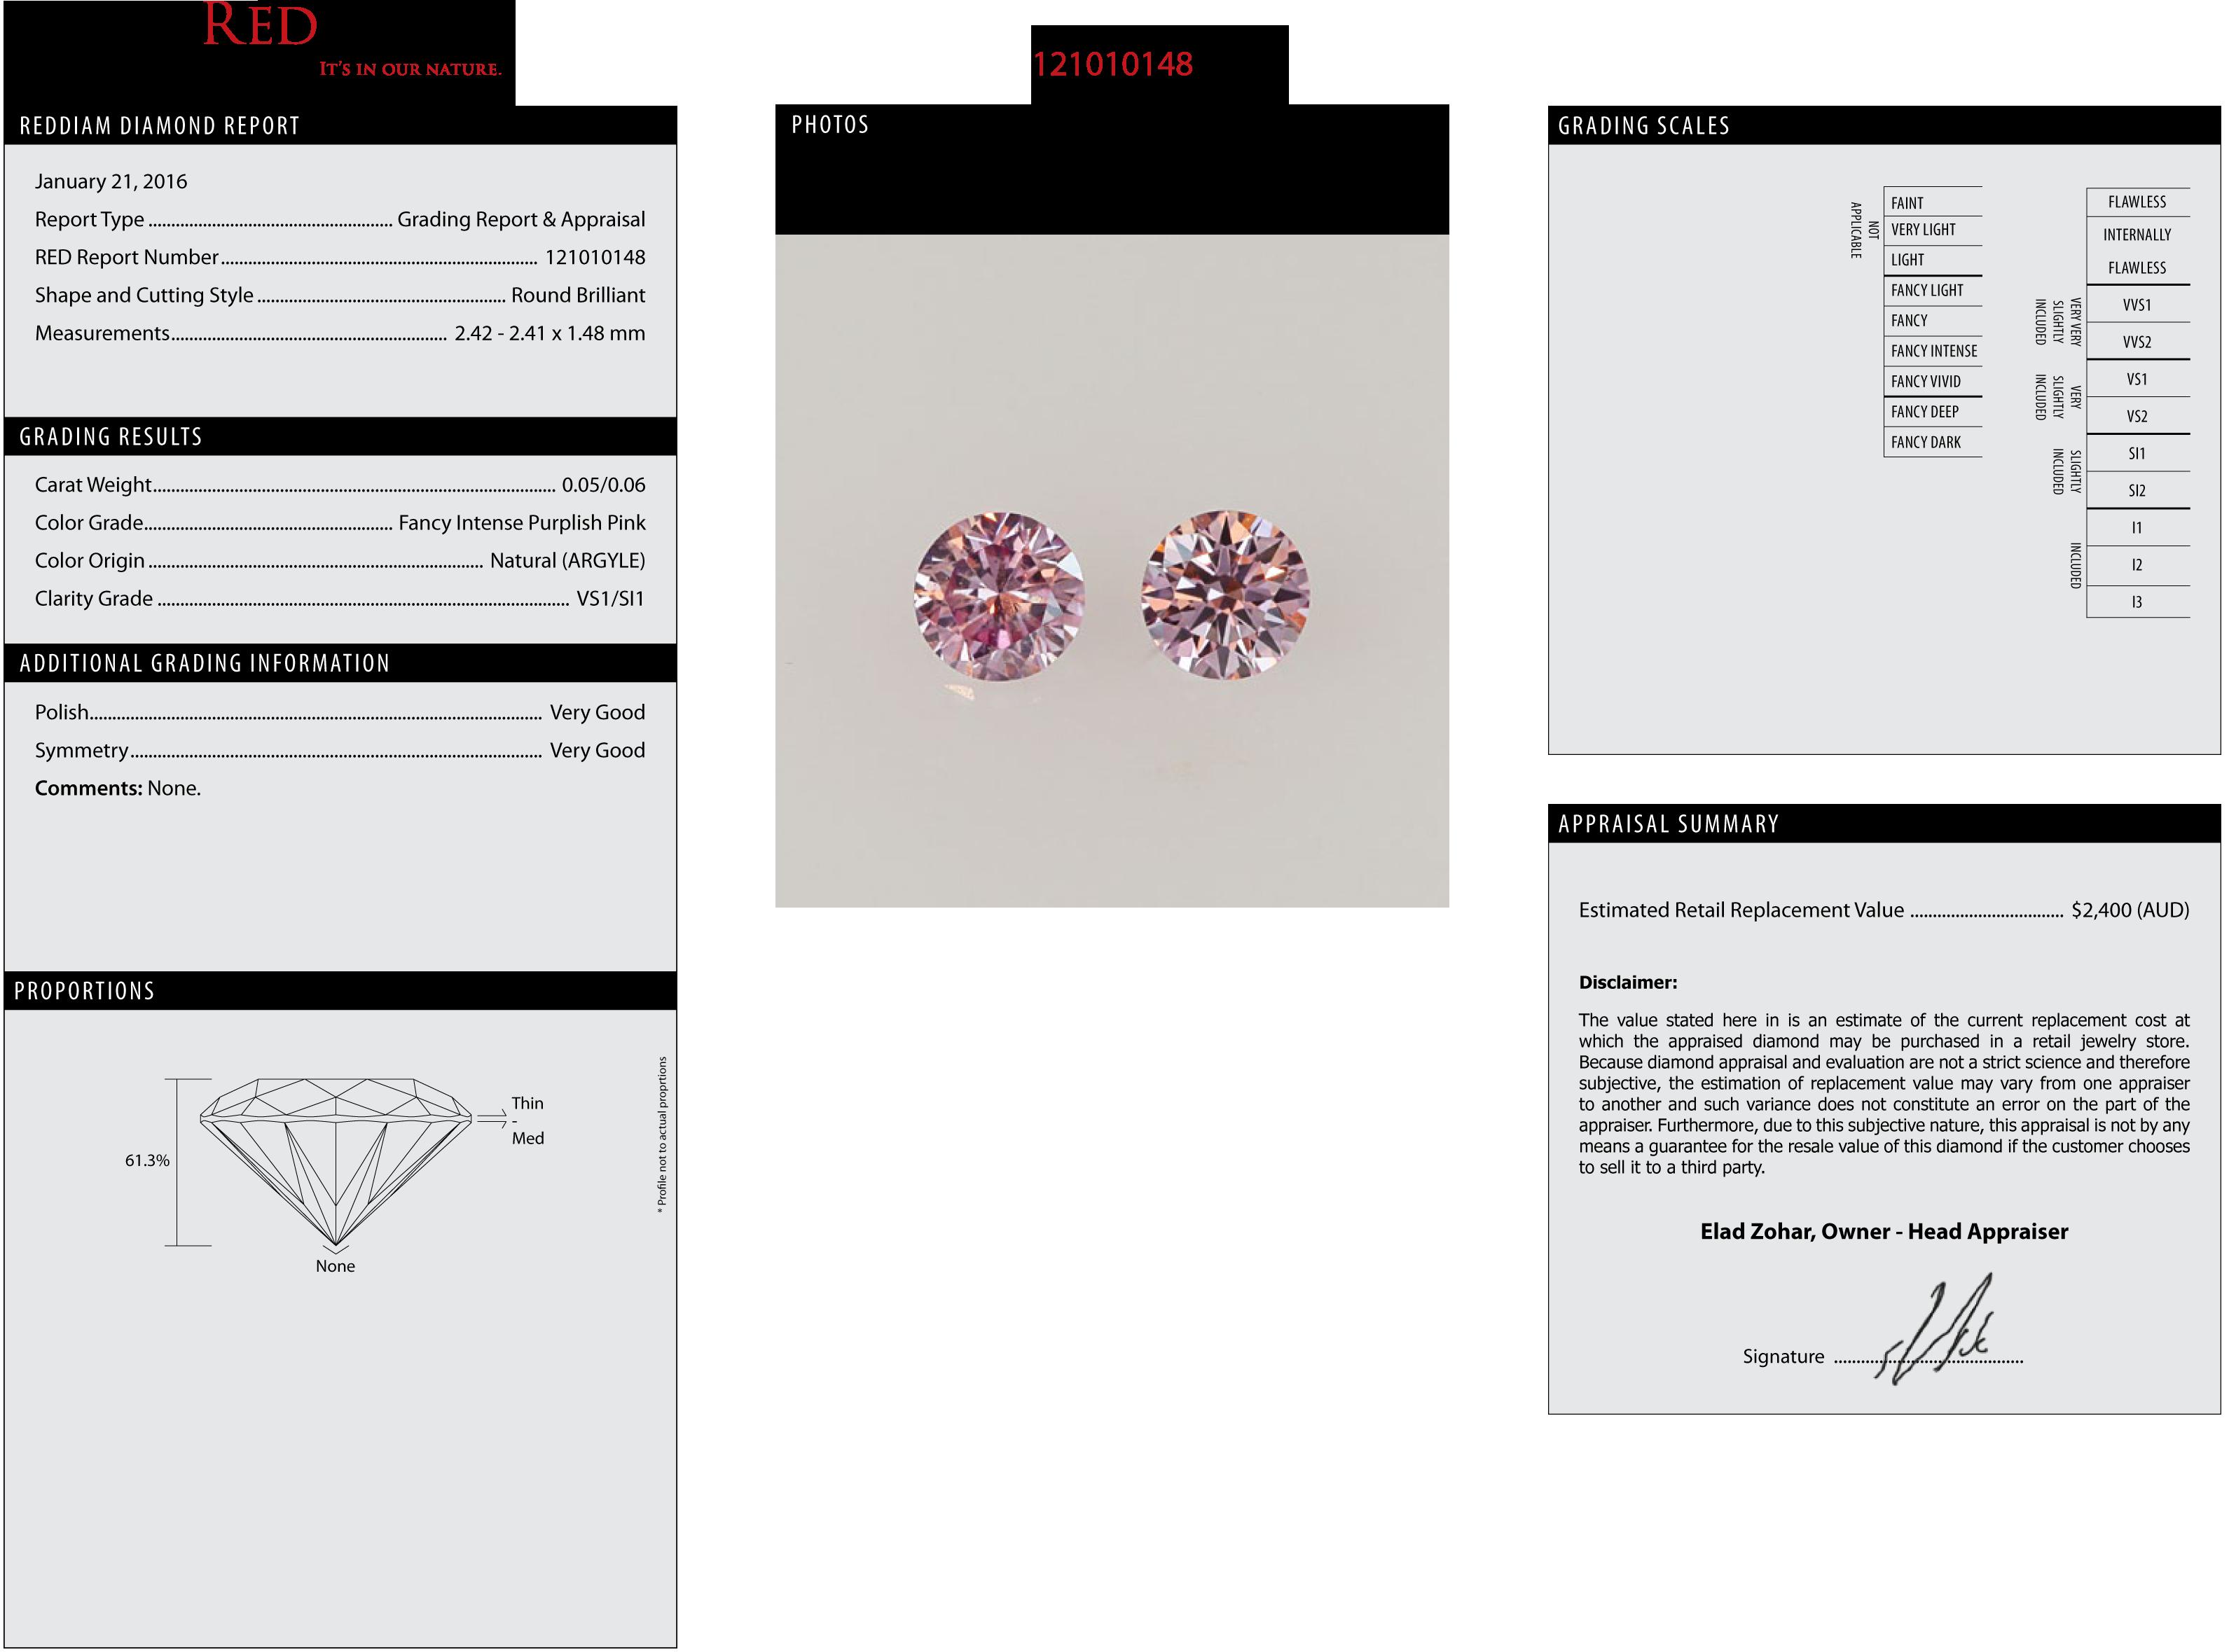 Diamond certificate gia appraisals reddiam ltd pink red certificate xflitez Image collections